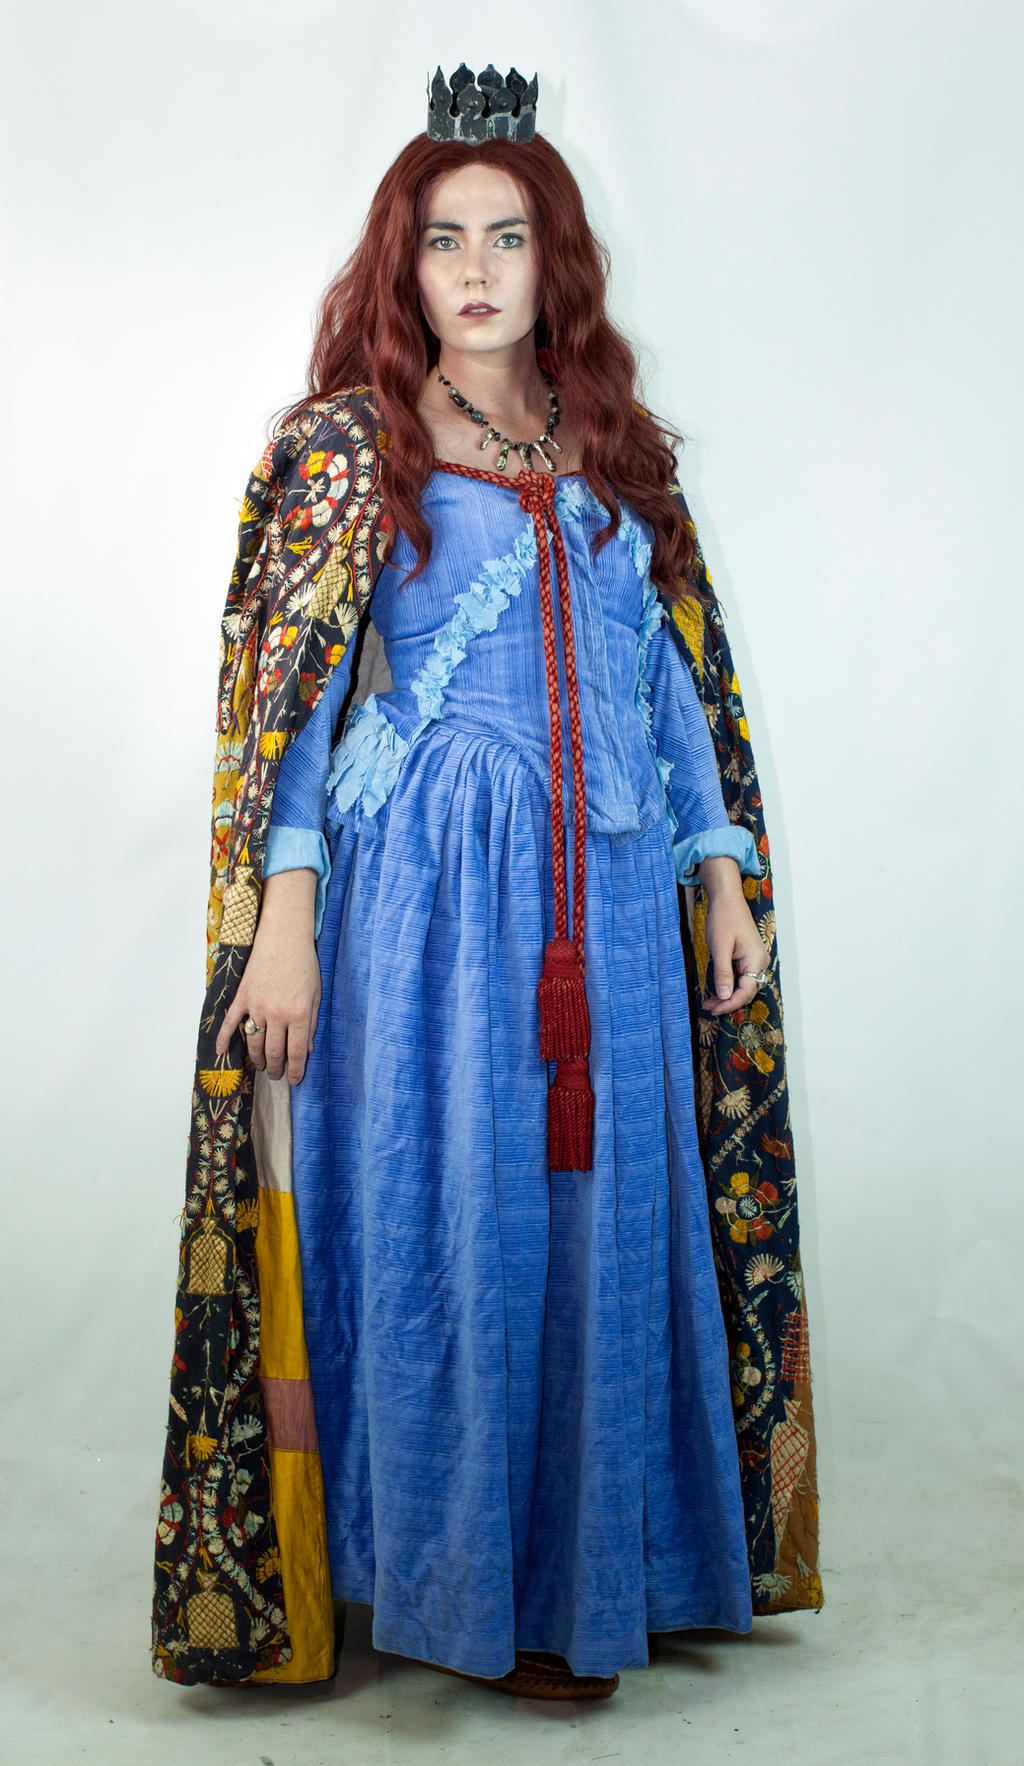 Eleanor 1 by magikstock